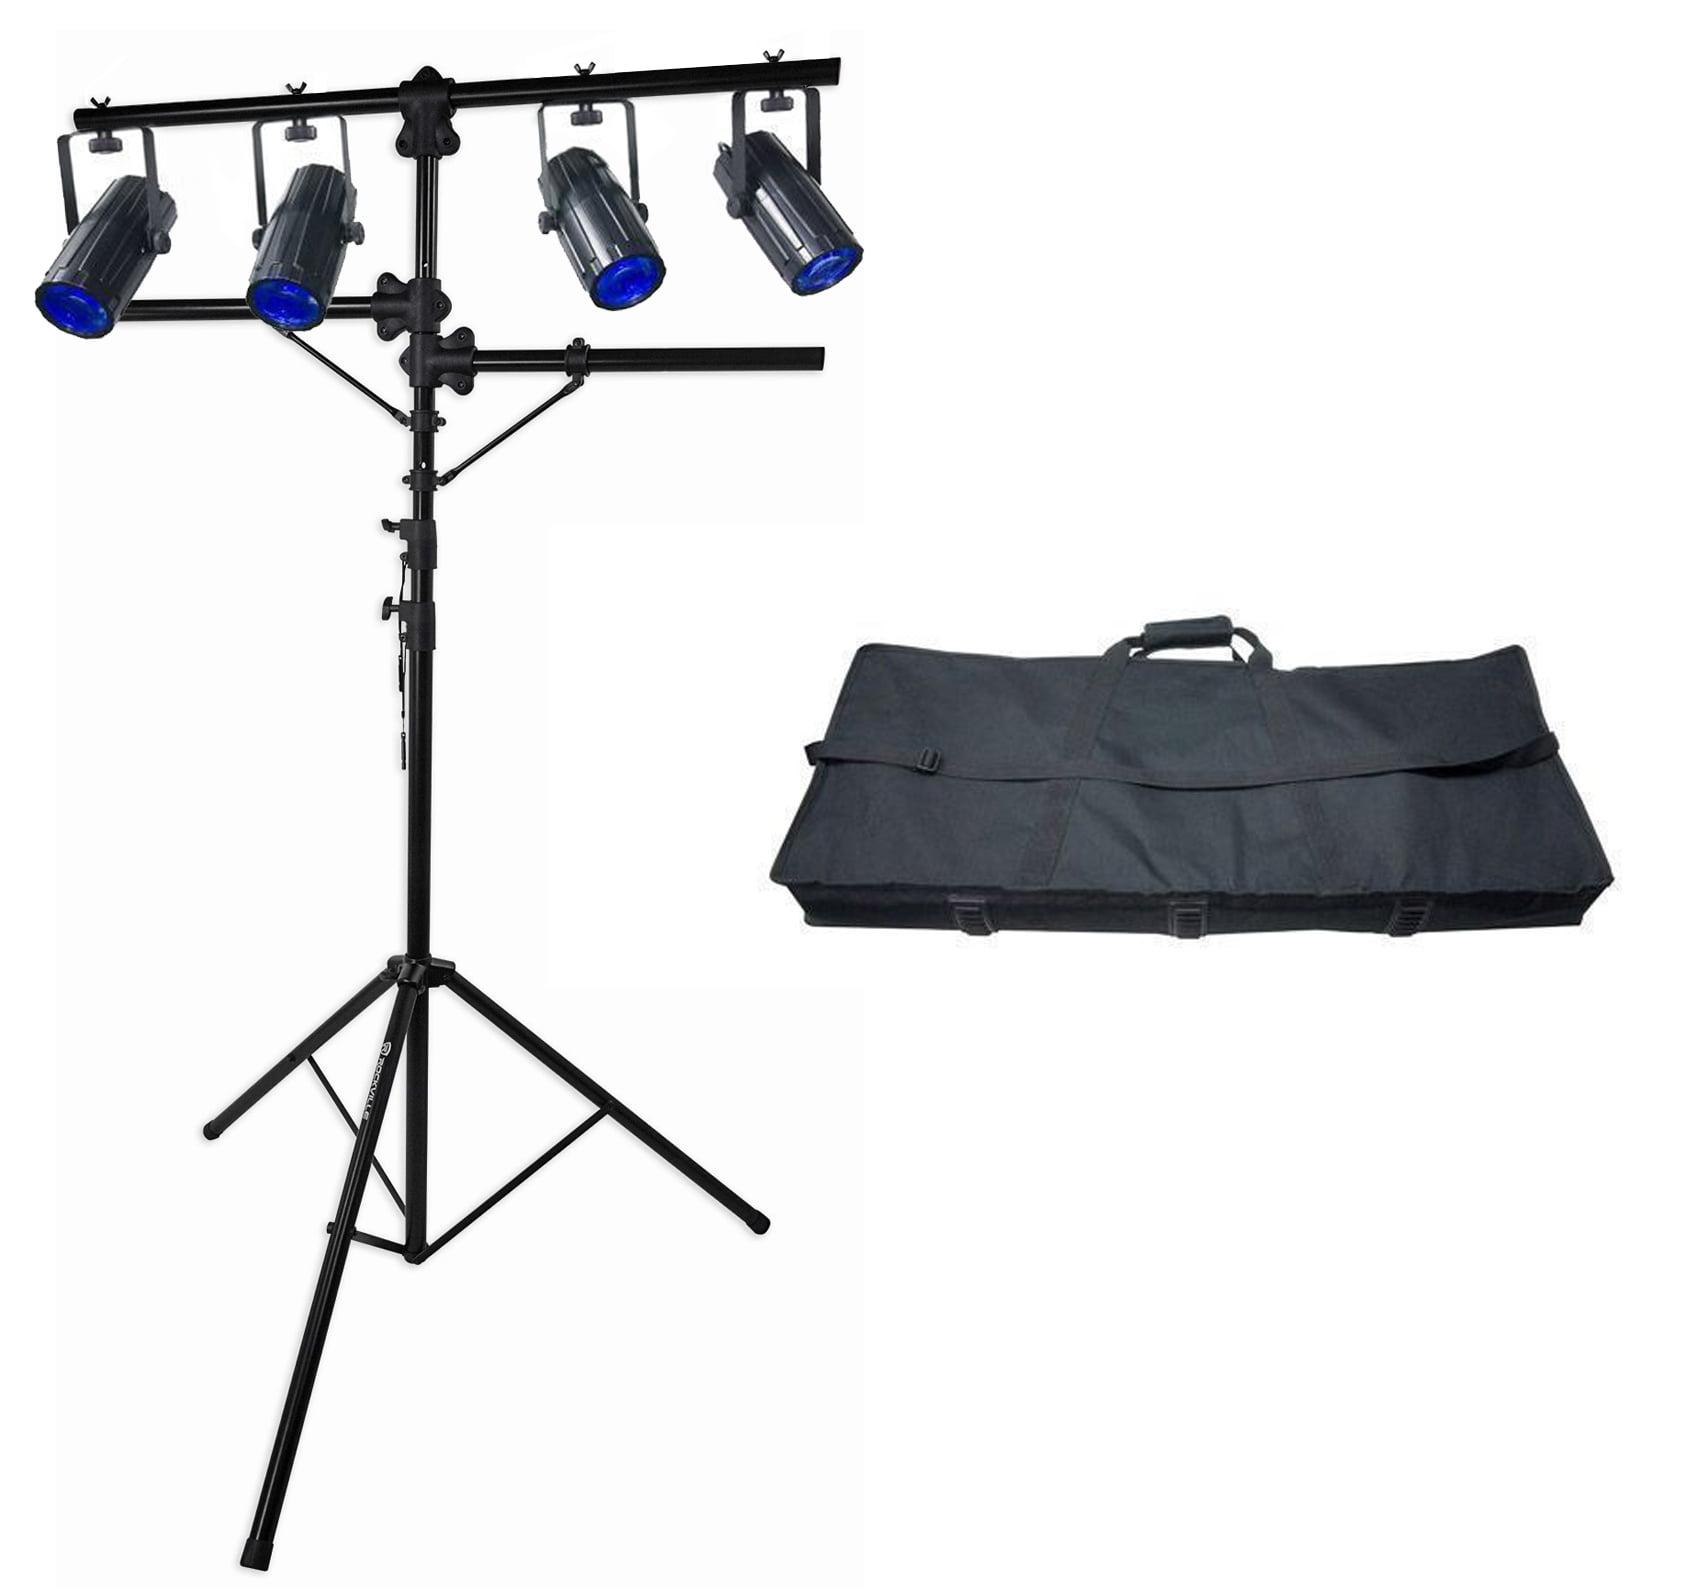 Chauvet DJ 4Play DMX-512 LED Light Beam FX System, DMX Moonflower Bar+Case+Stand